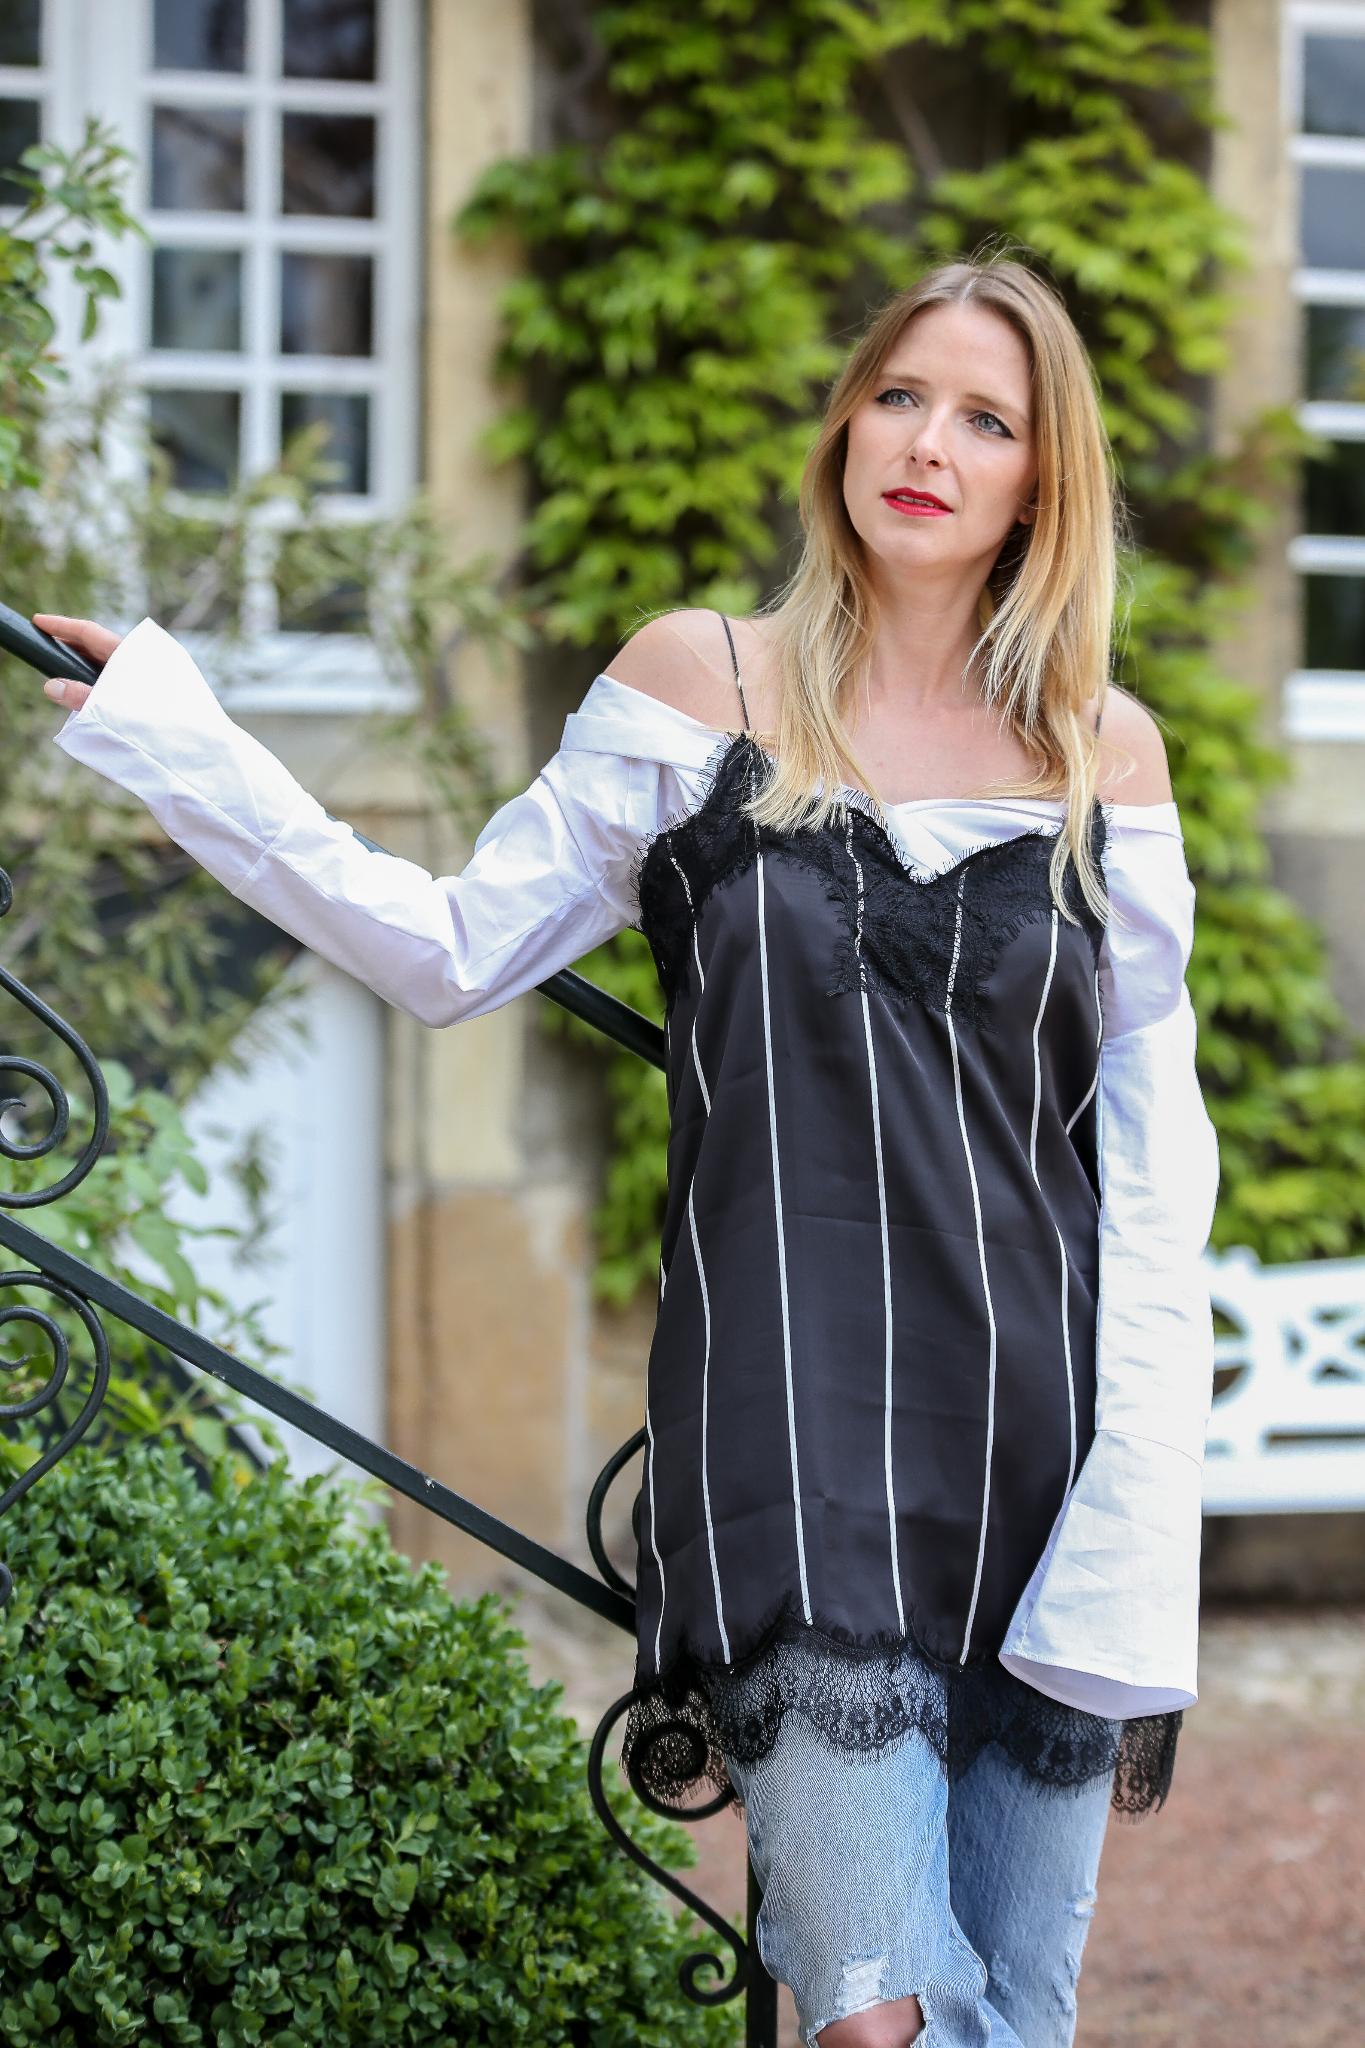 Fashion_Outfit_Off_Shoulder_Striped_Slipdress_MOD - by Monique-12